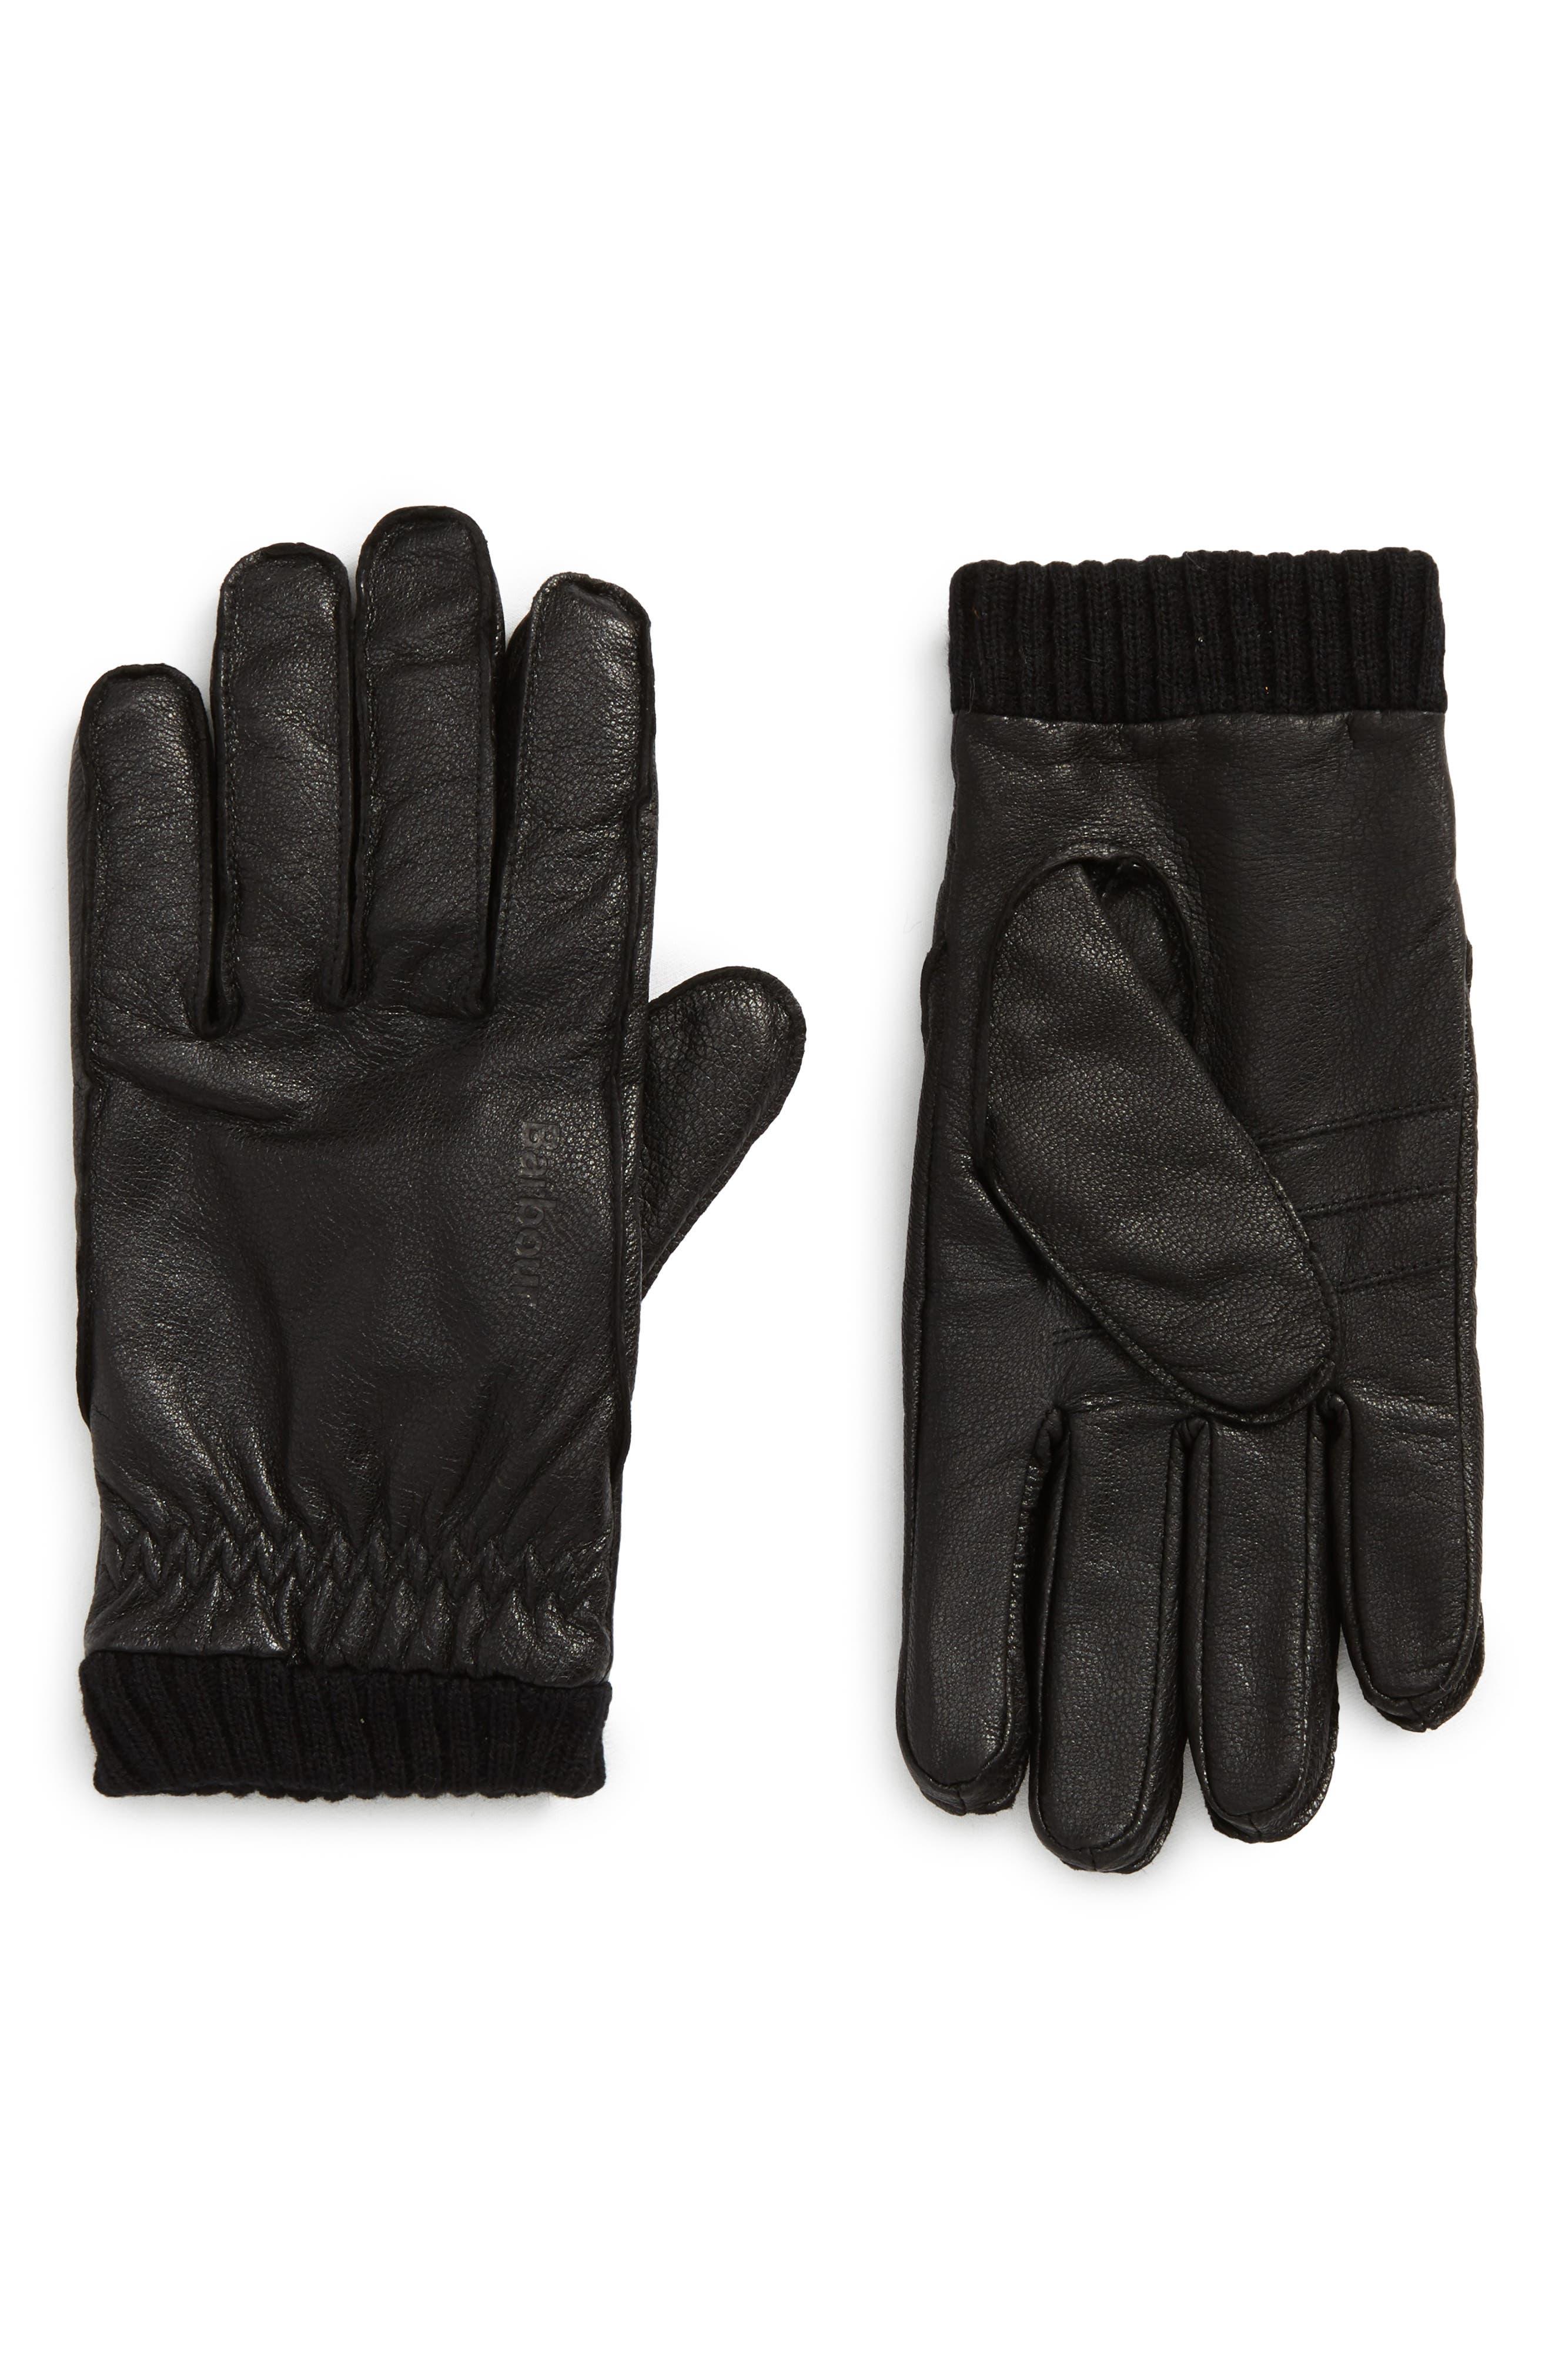 Barrow Leather Gloves,                         Main,                         color,